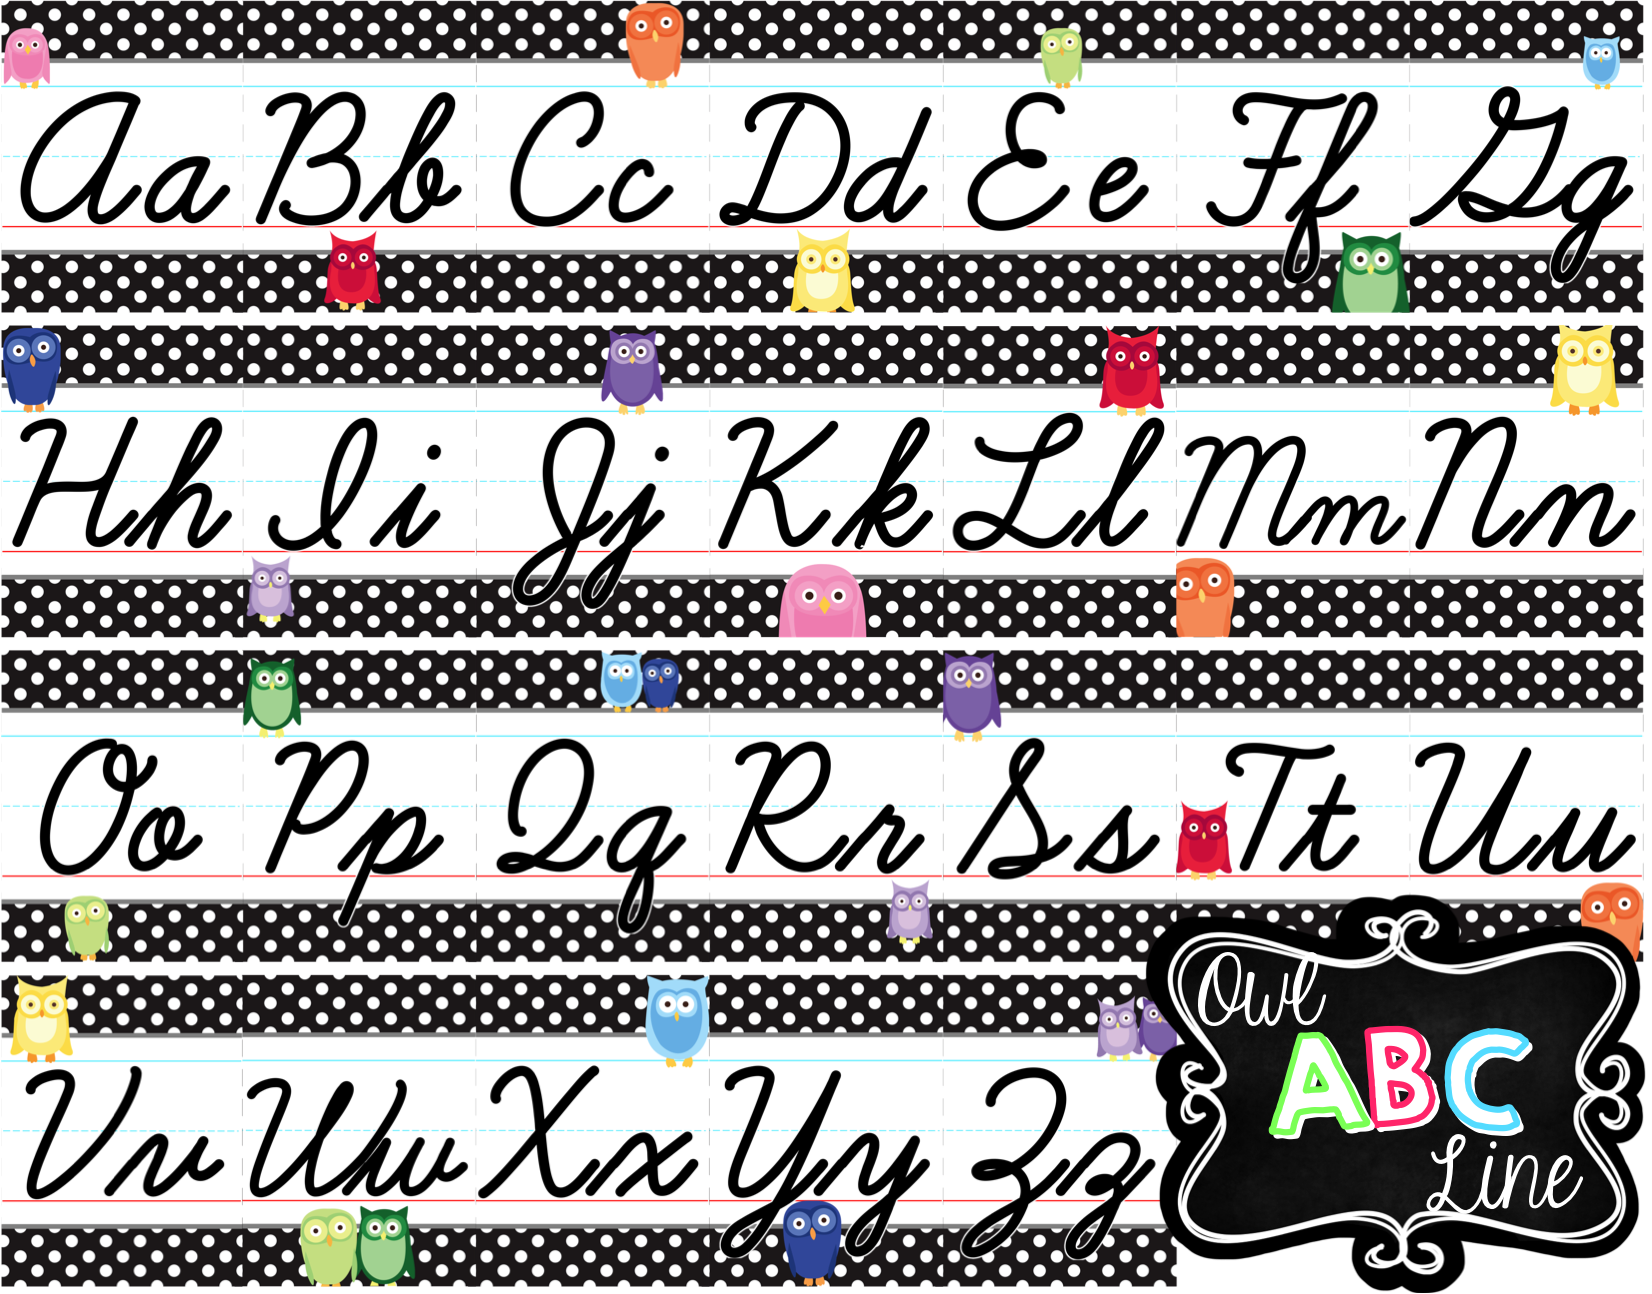 Cursive Alphabet Line - Rainbow Owl With Black & White Polka